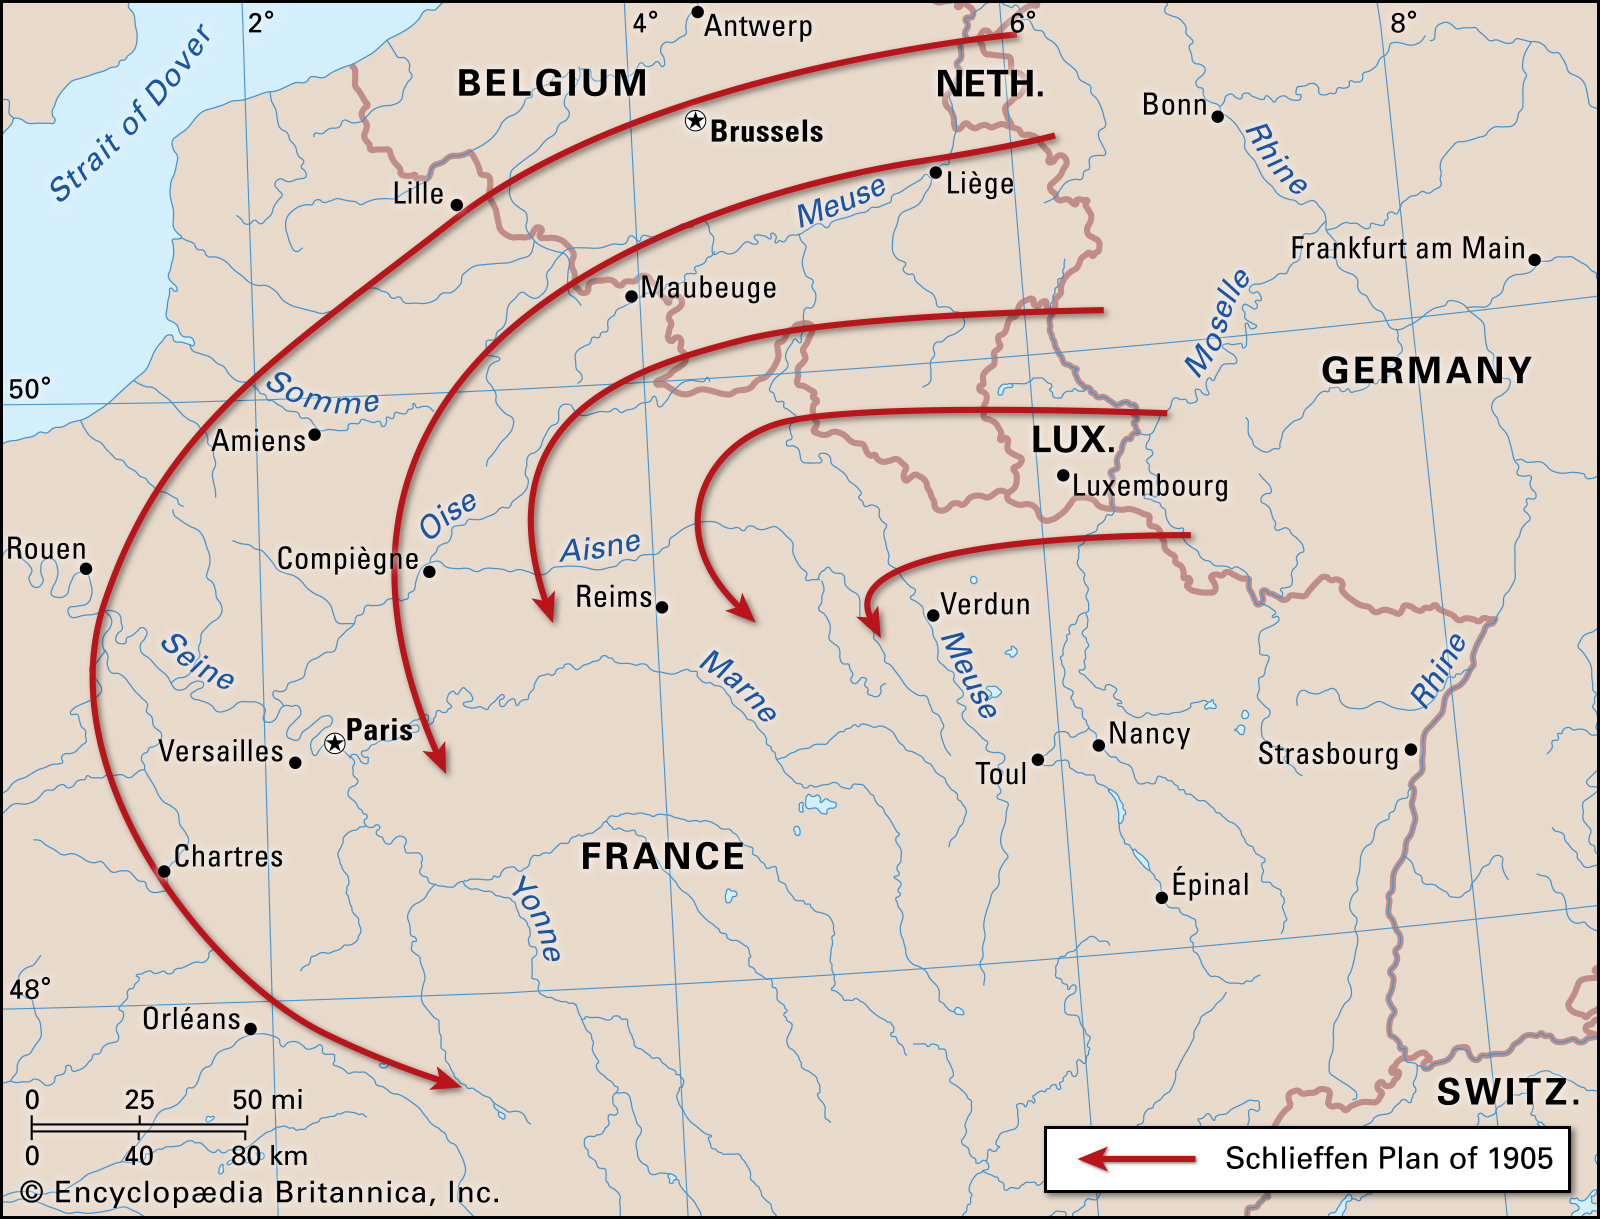 Map of the Schlieffen Plan of 1905